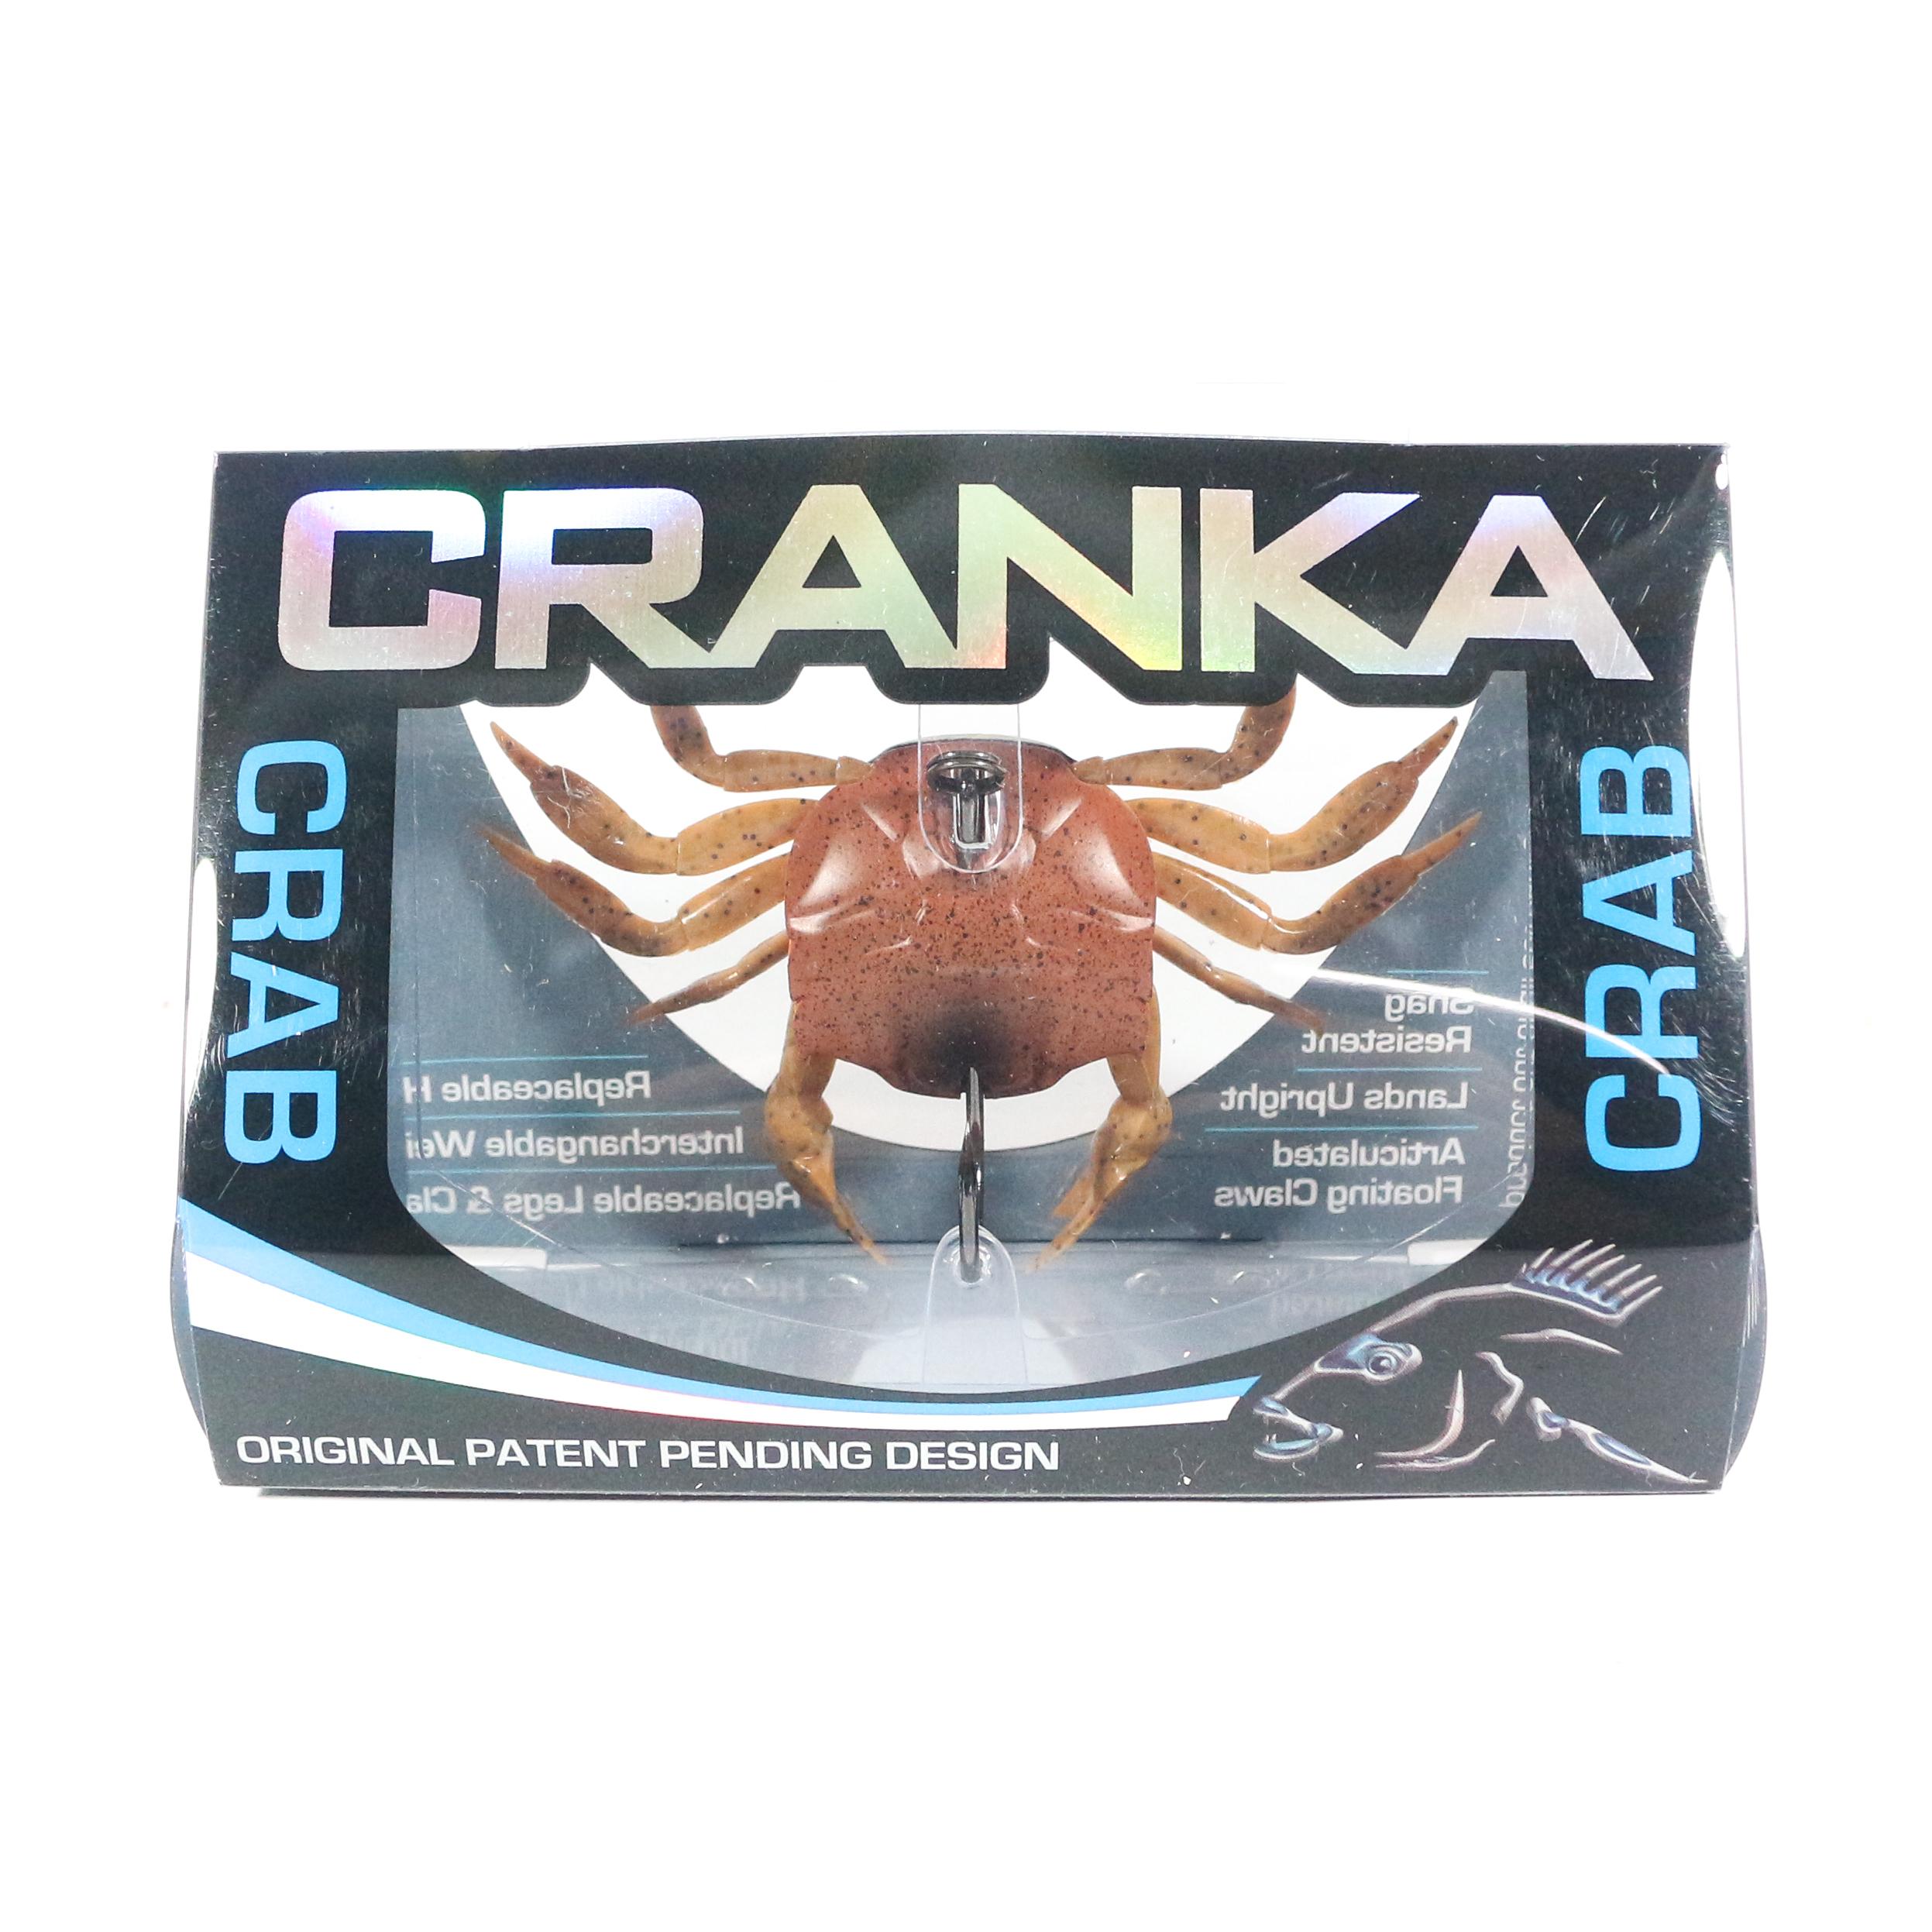 Cranka Crab Sinking Lure 21 grams CRS-85-SPT (5464)